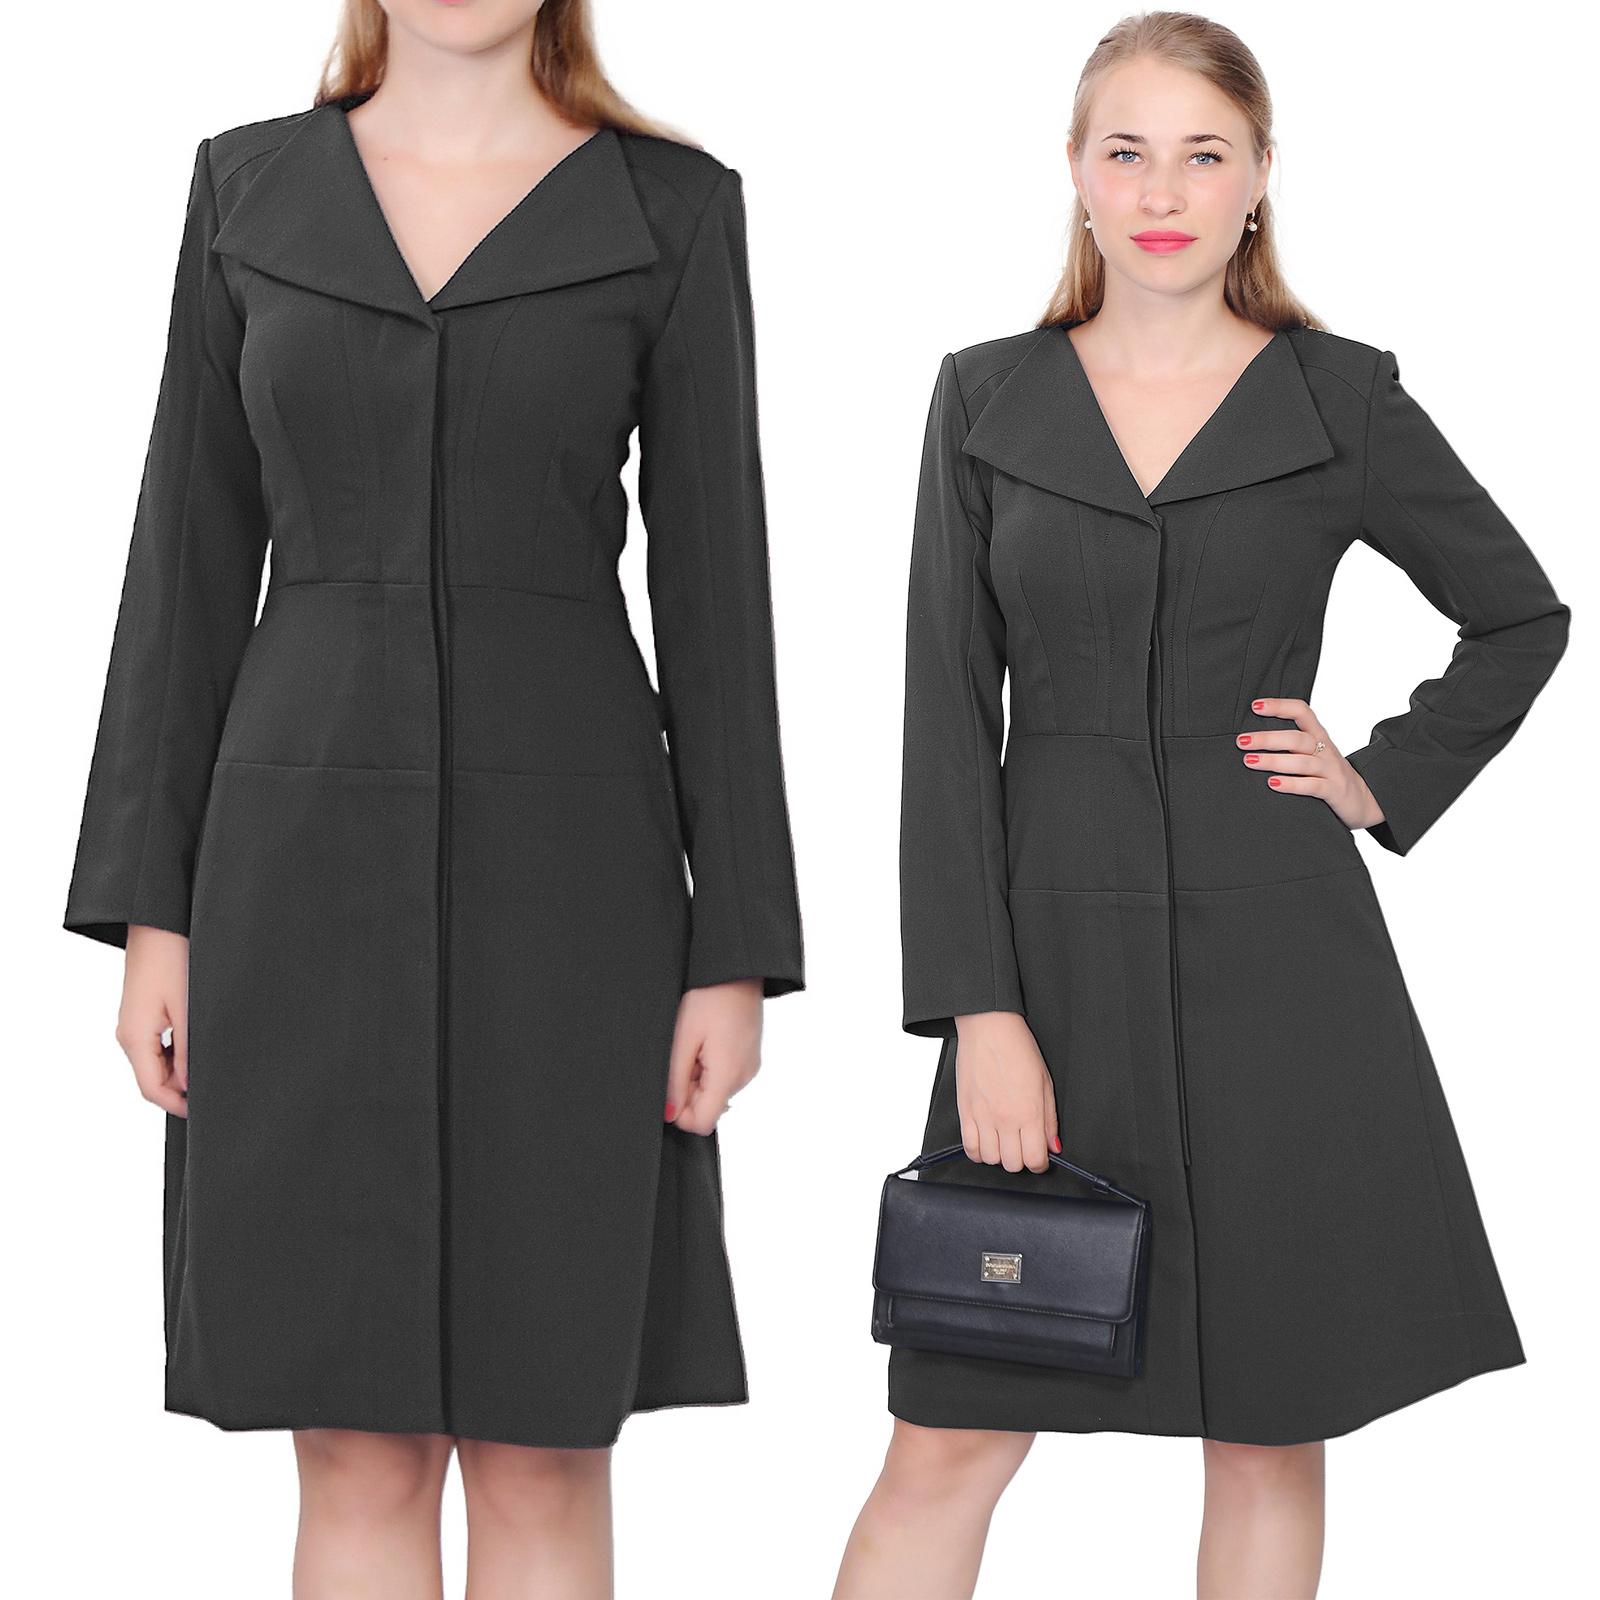 ELEGANT CLASSY TRAPEZE COAT DRESS VINTAGE 1950S COATDRESS COAT ...